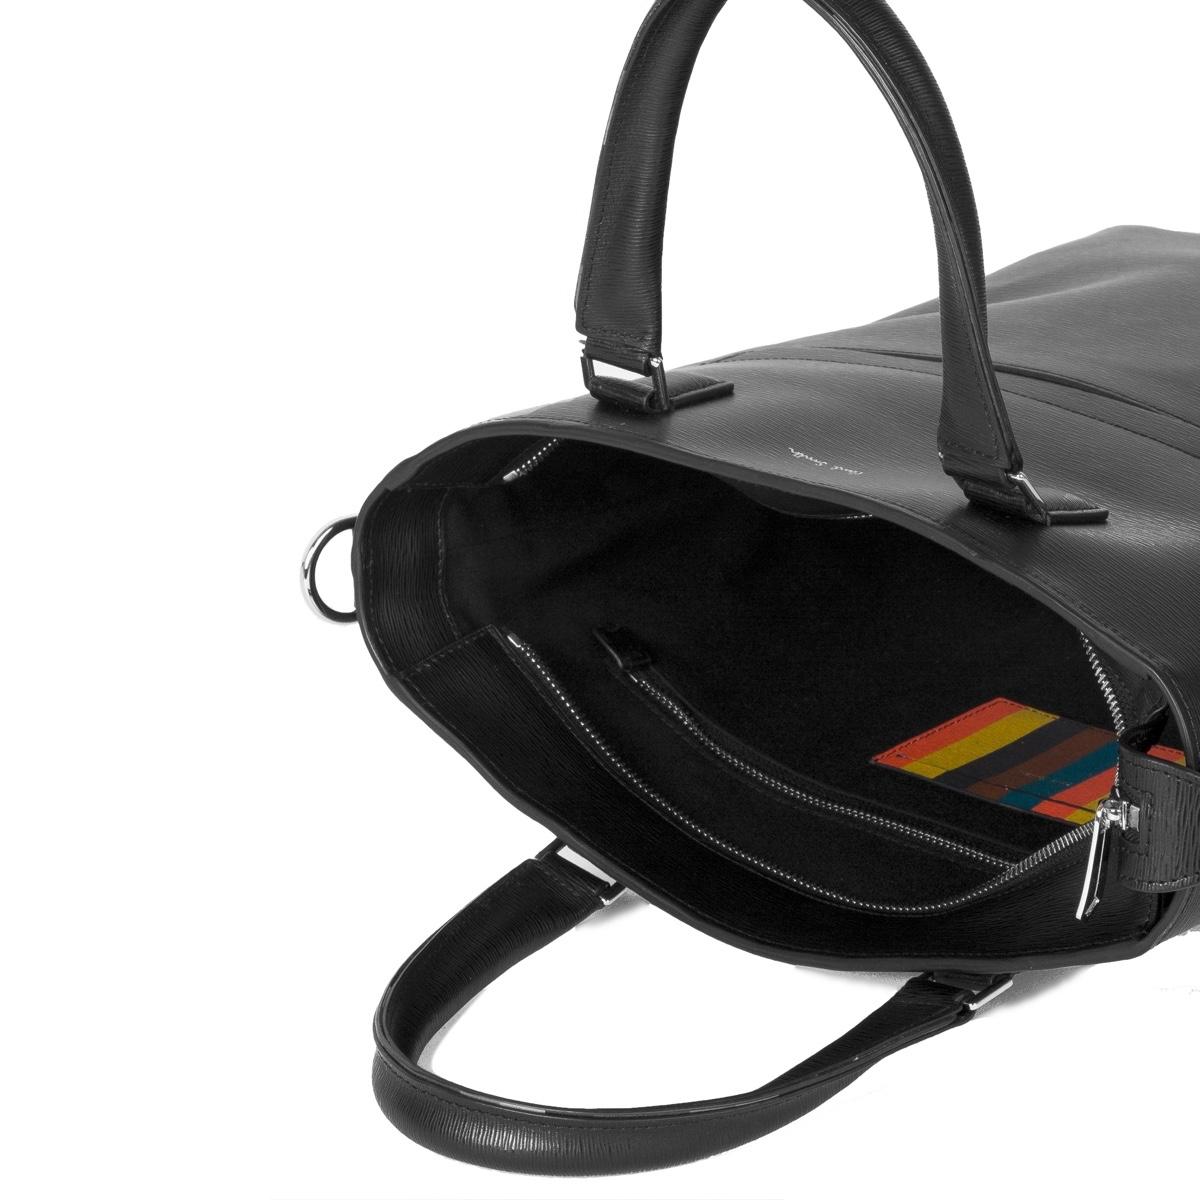 paul-smith-Black-Black-Embossed-Leather-Tote-Bag-With-bright-Stripe-Trim.jpg